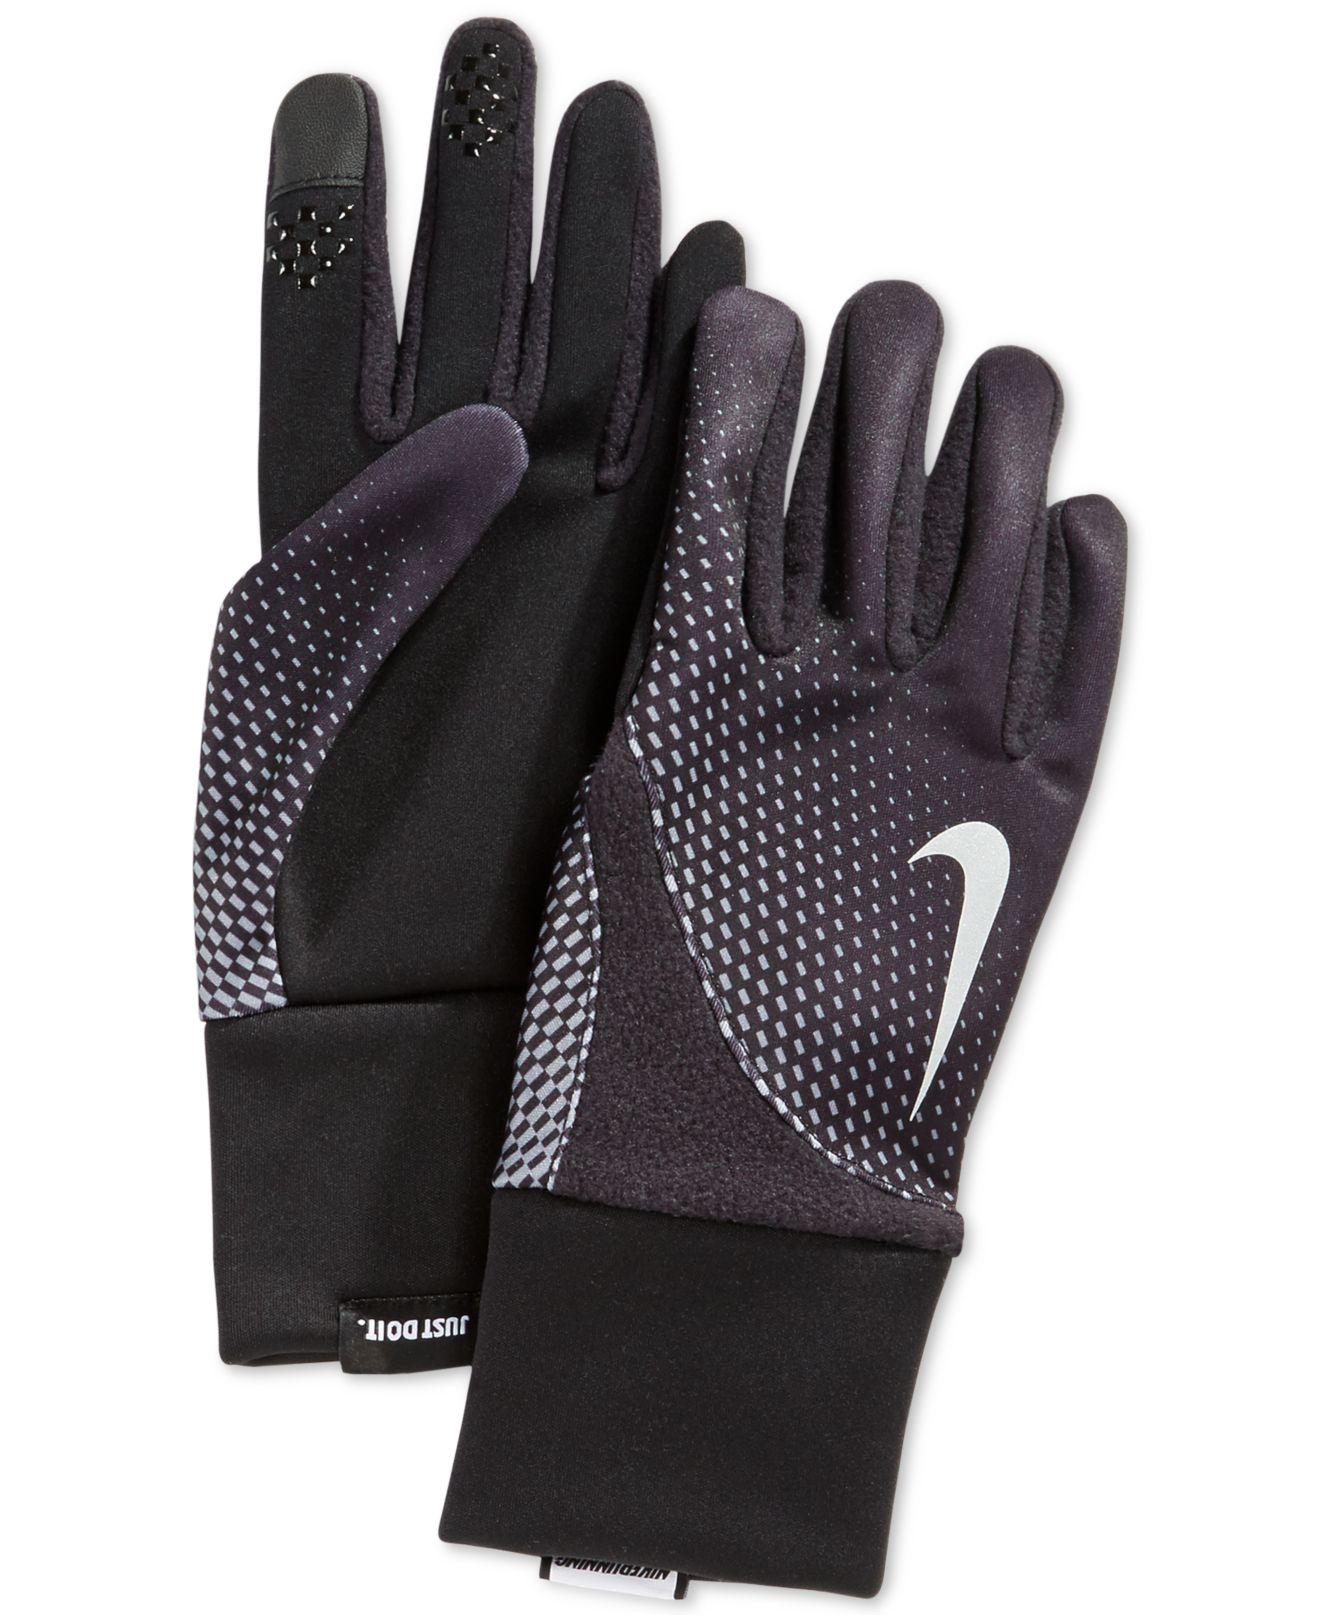 8c2f8c5b9f5f Lyst - Nike Men s Element Thermal 2.0 Run Gloves in Black for Men